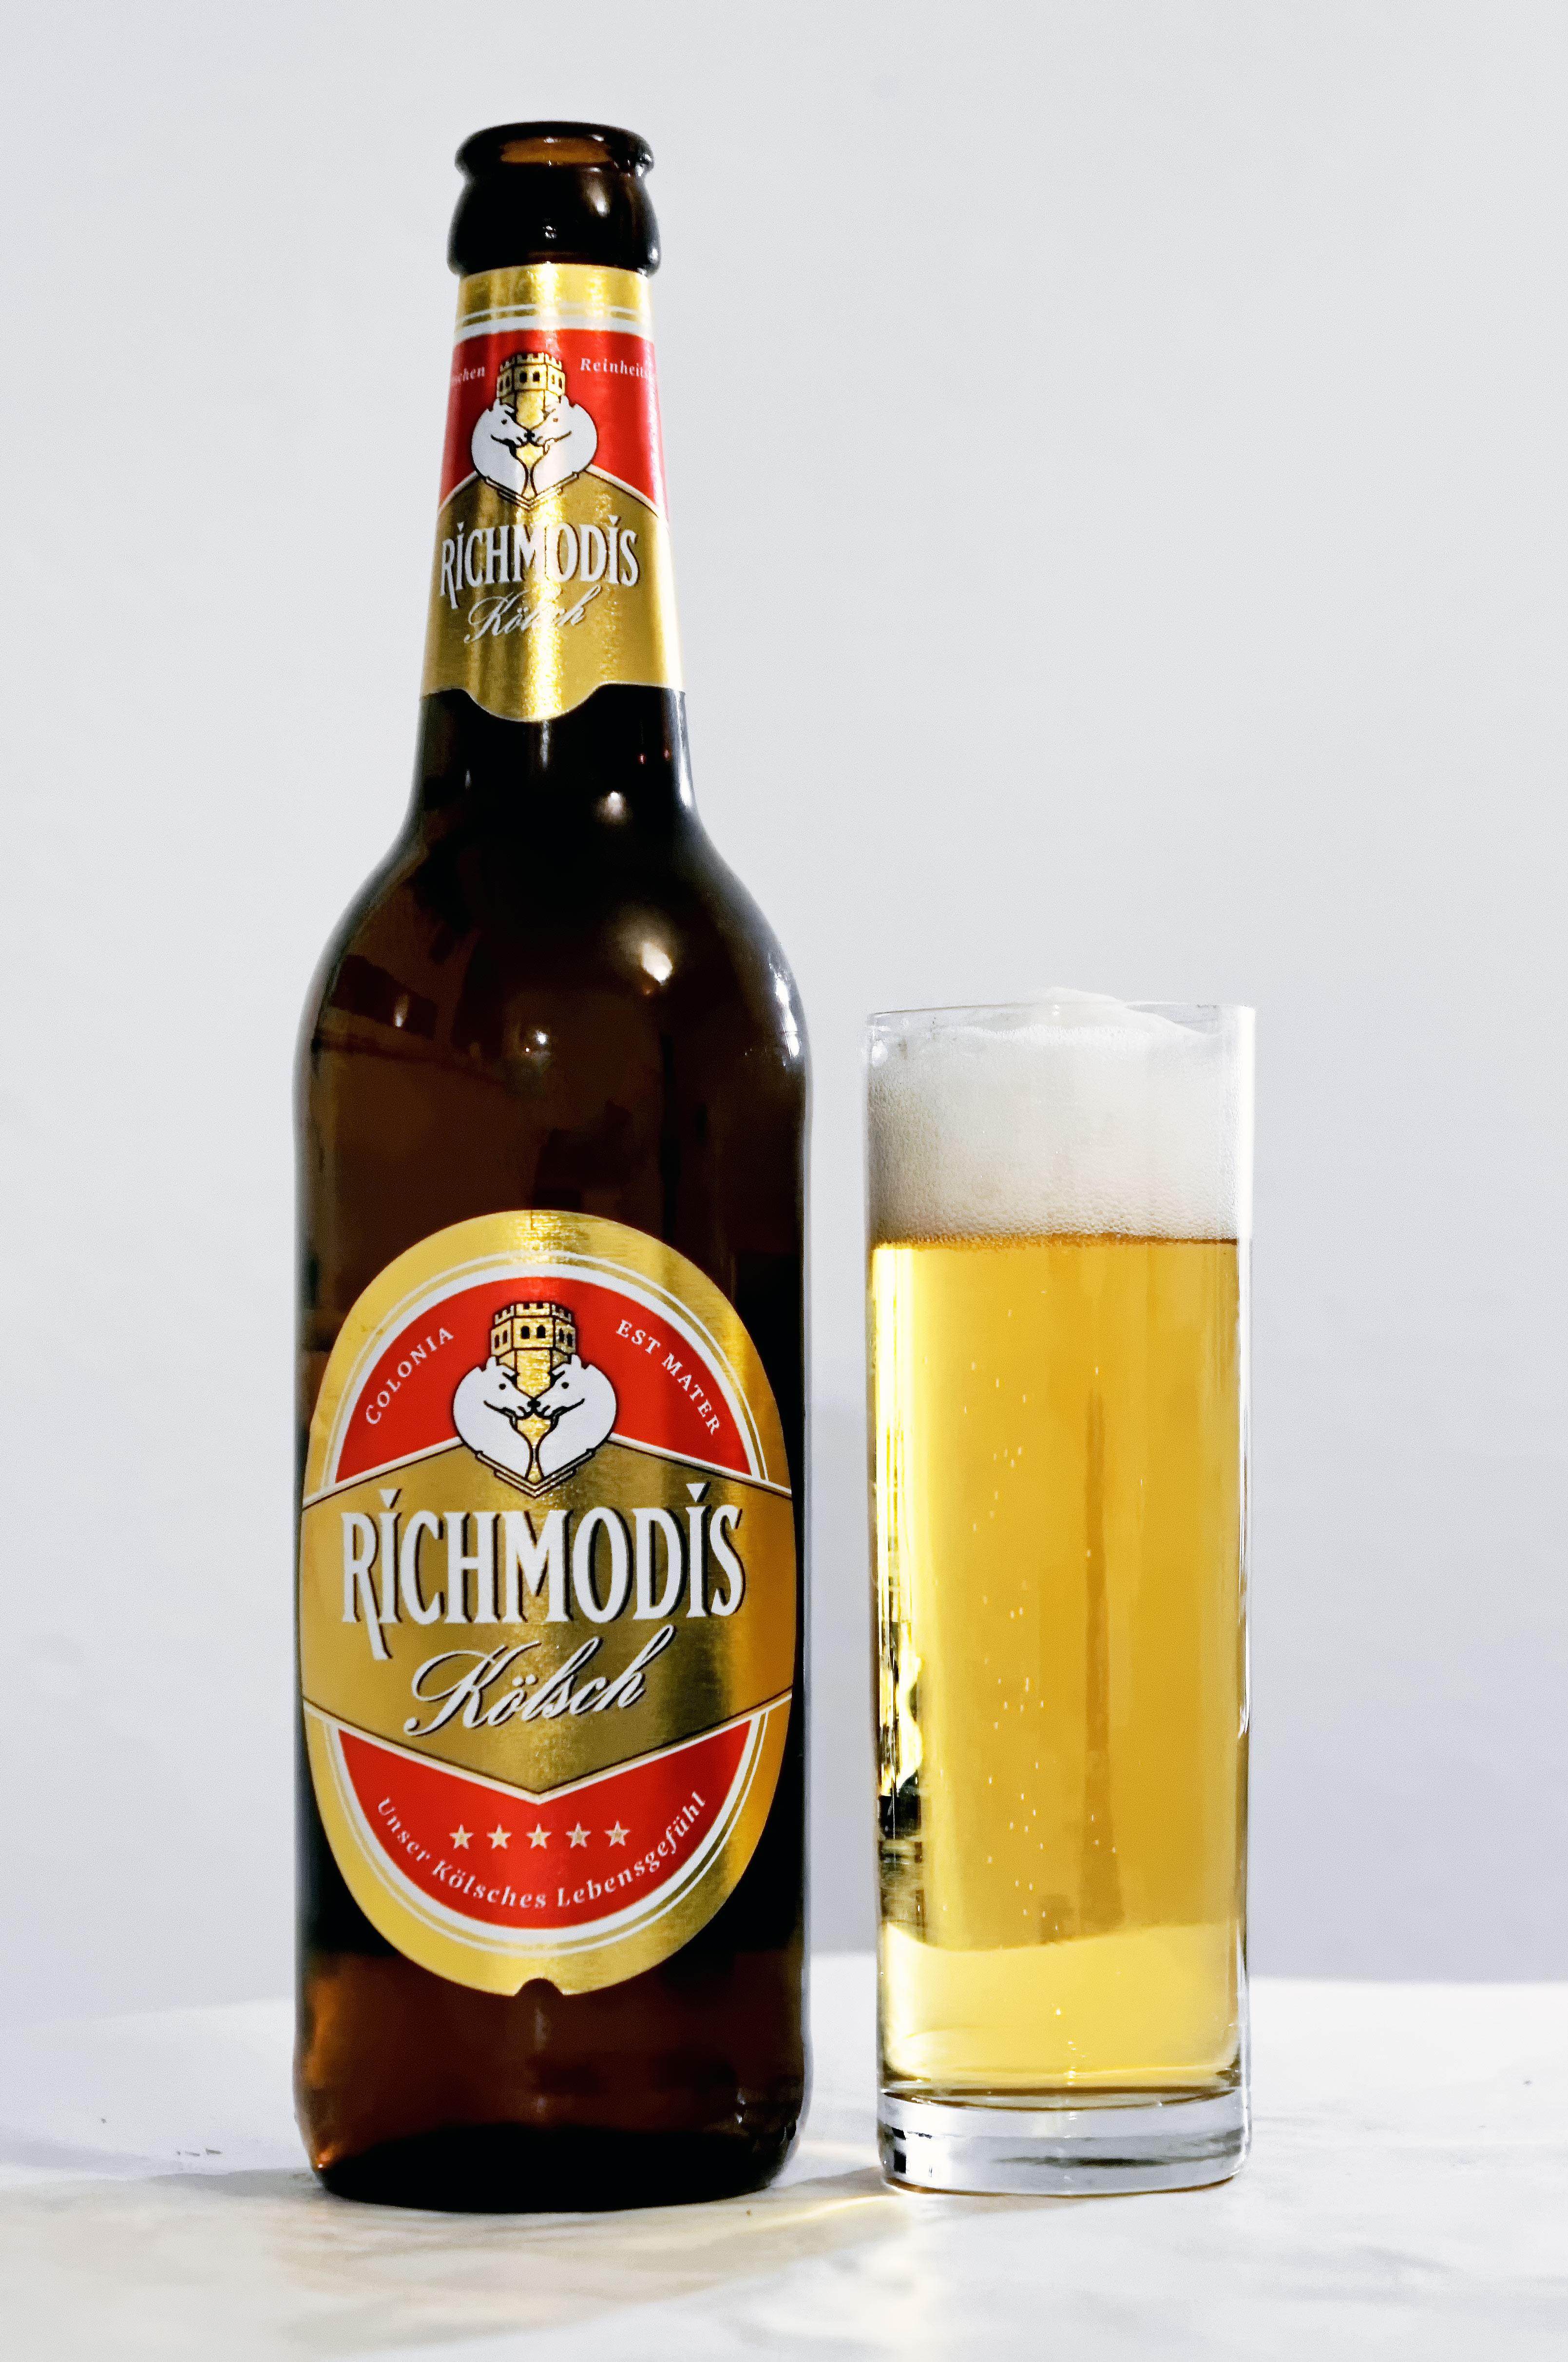 Richmodis